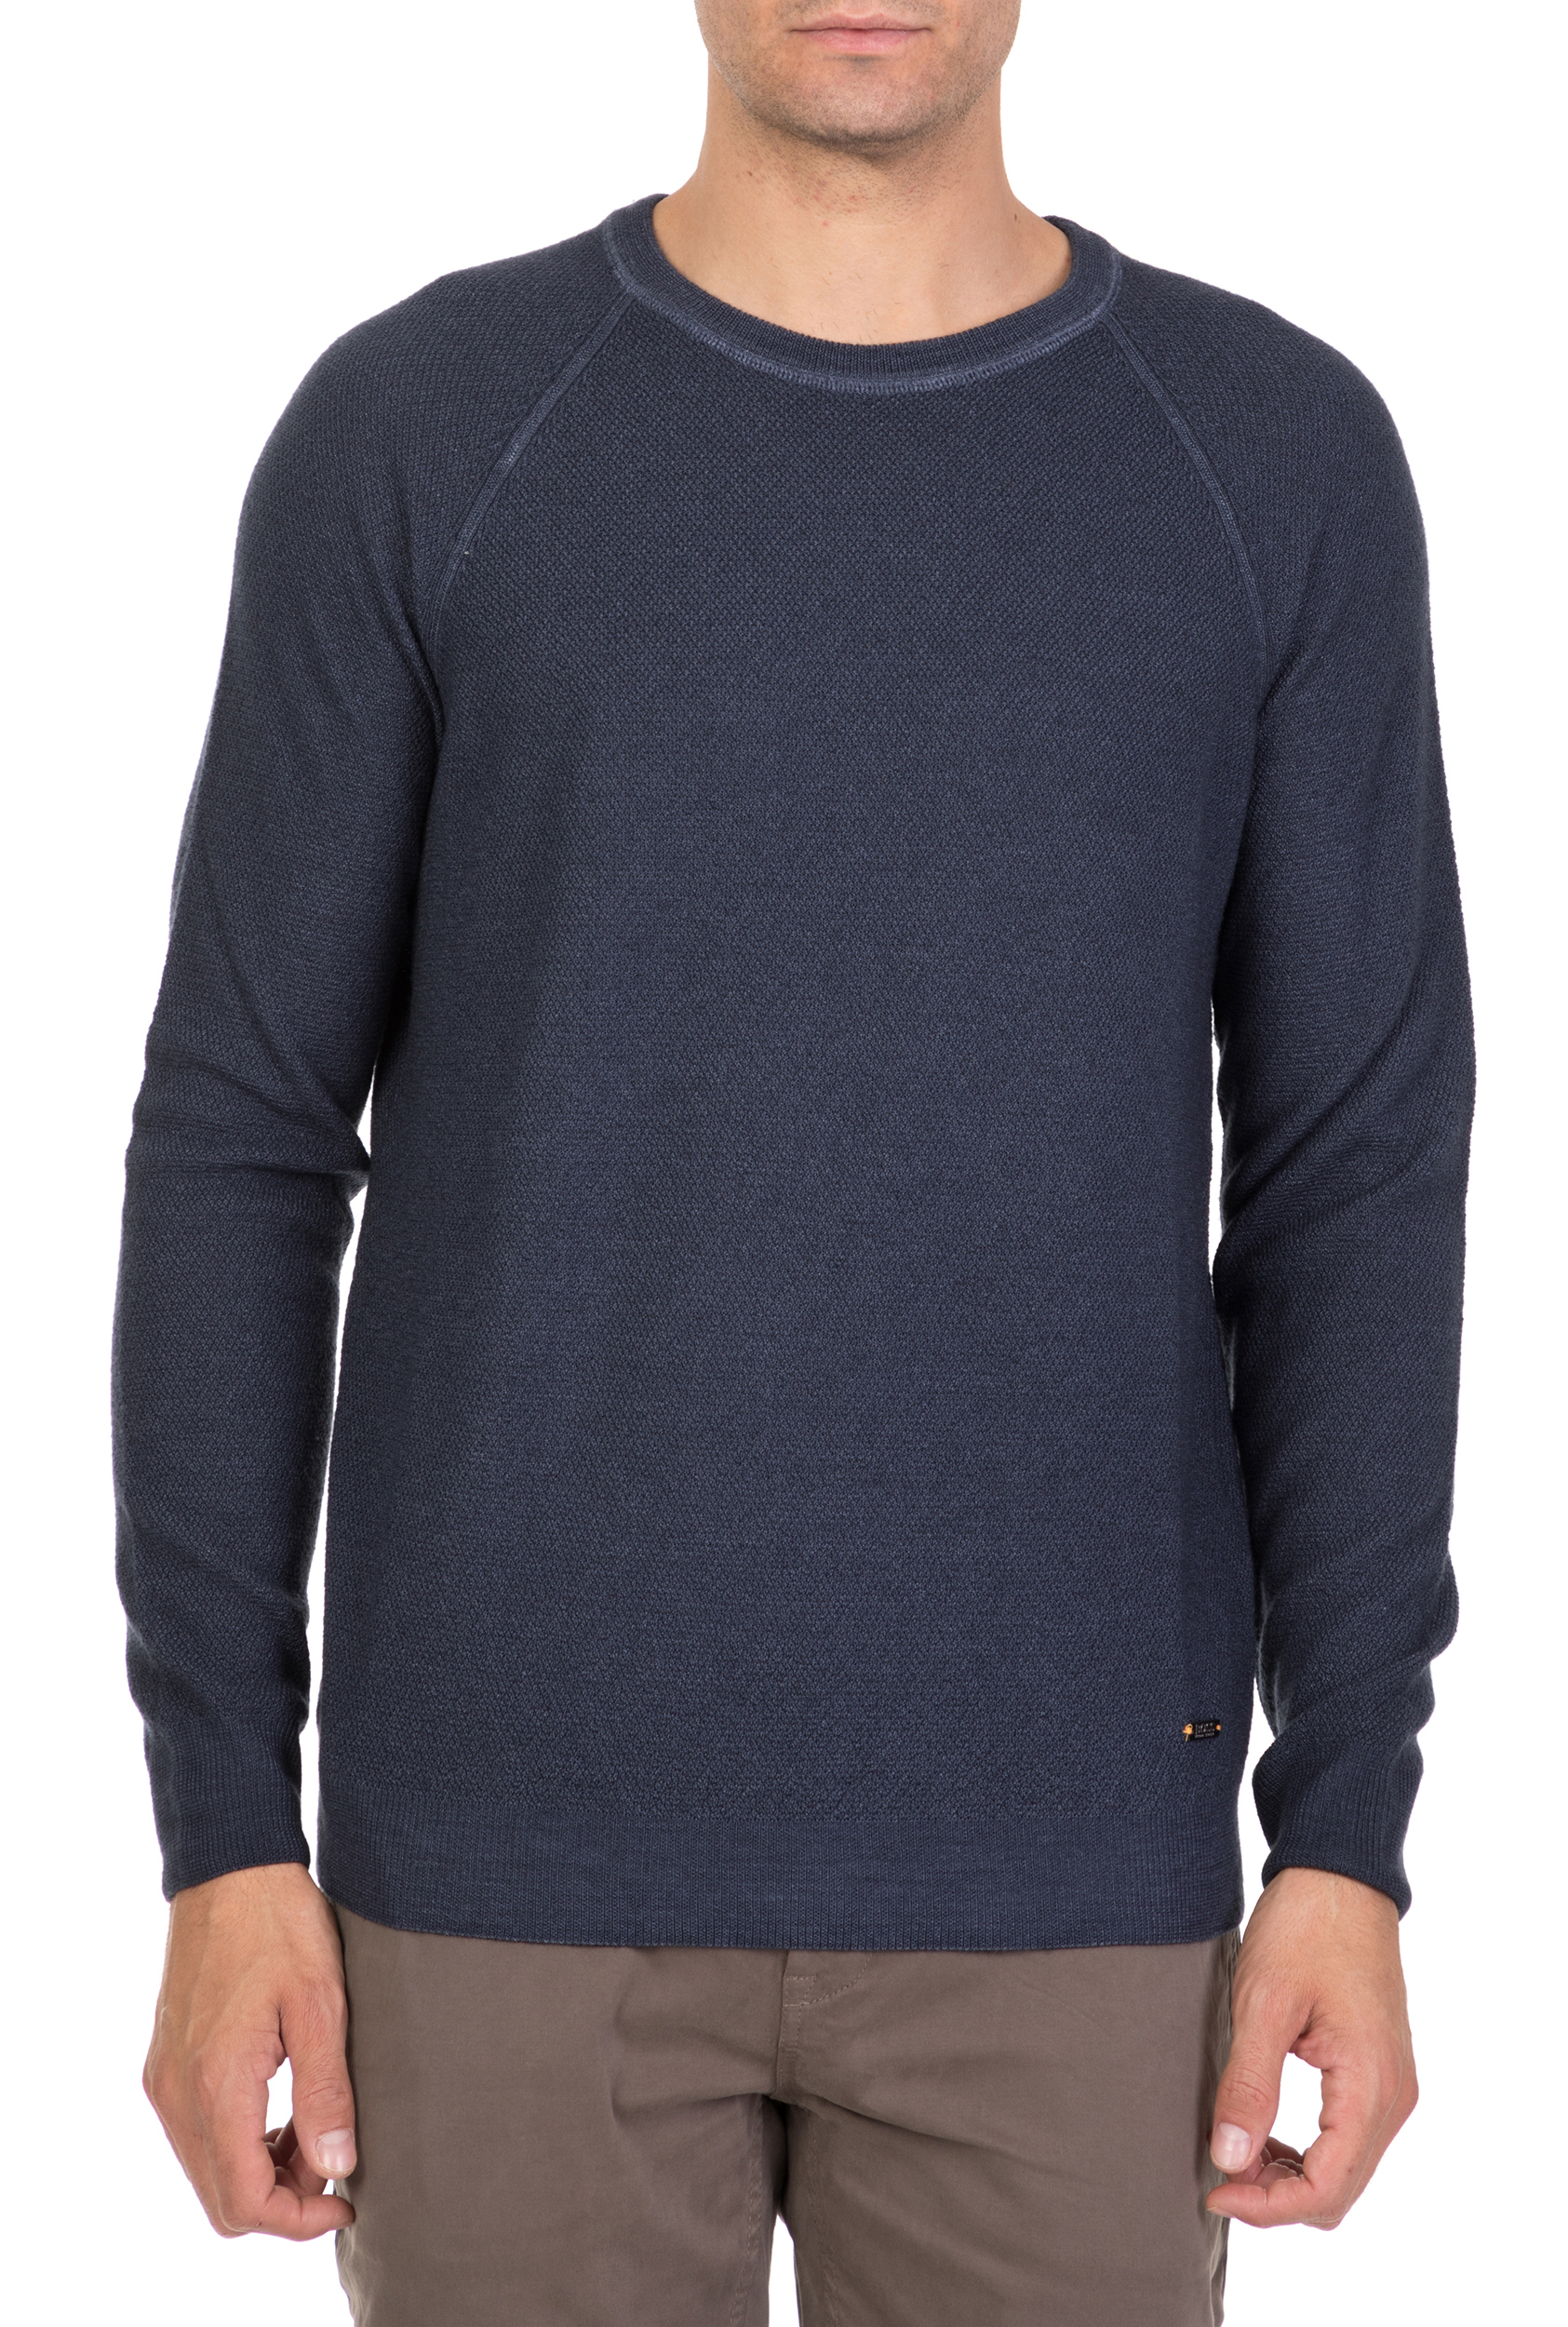 460e26f79f62 CollectiveOnline BOSS - Ανδρική μακρυμάνικη μπλούζα BOSS Akutisro μπλε